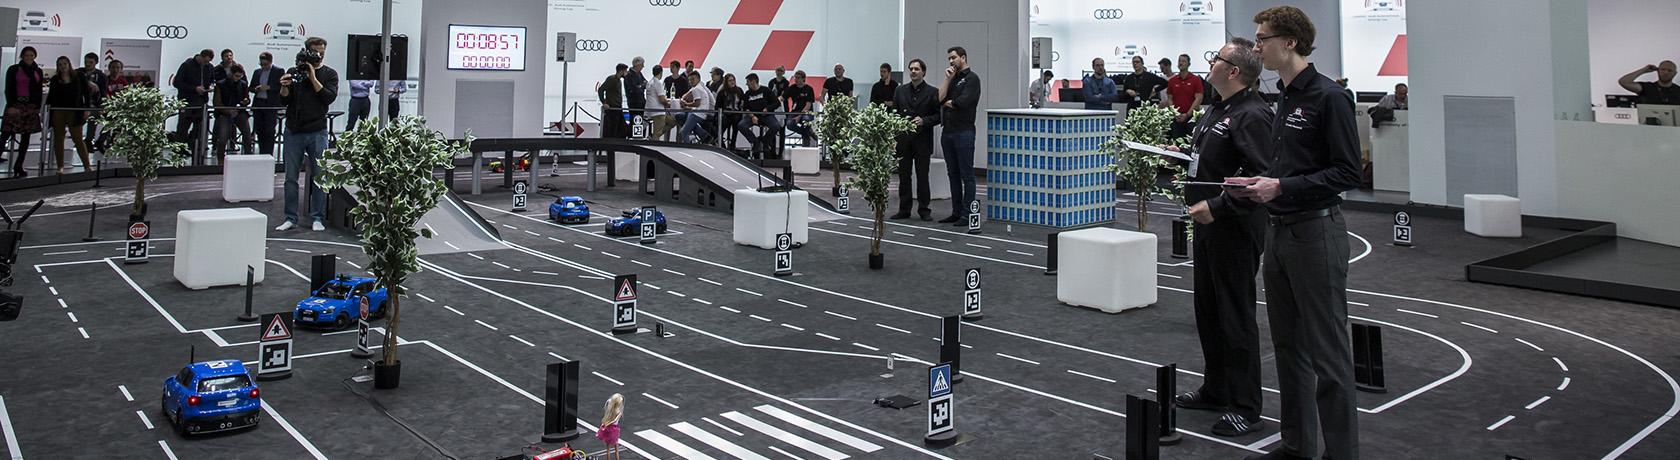 A contest between high-tech models to develop autonomous driving